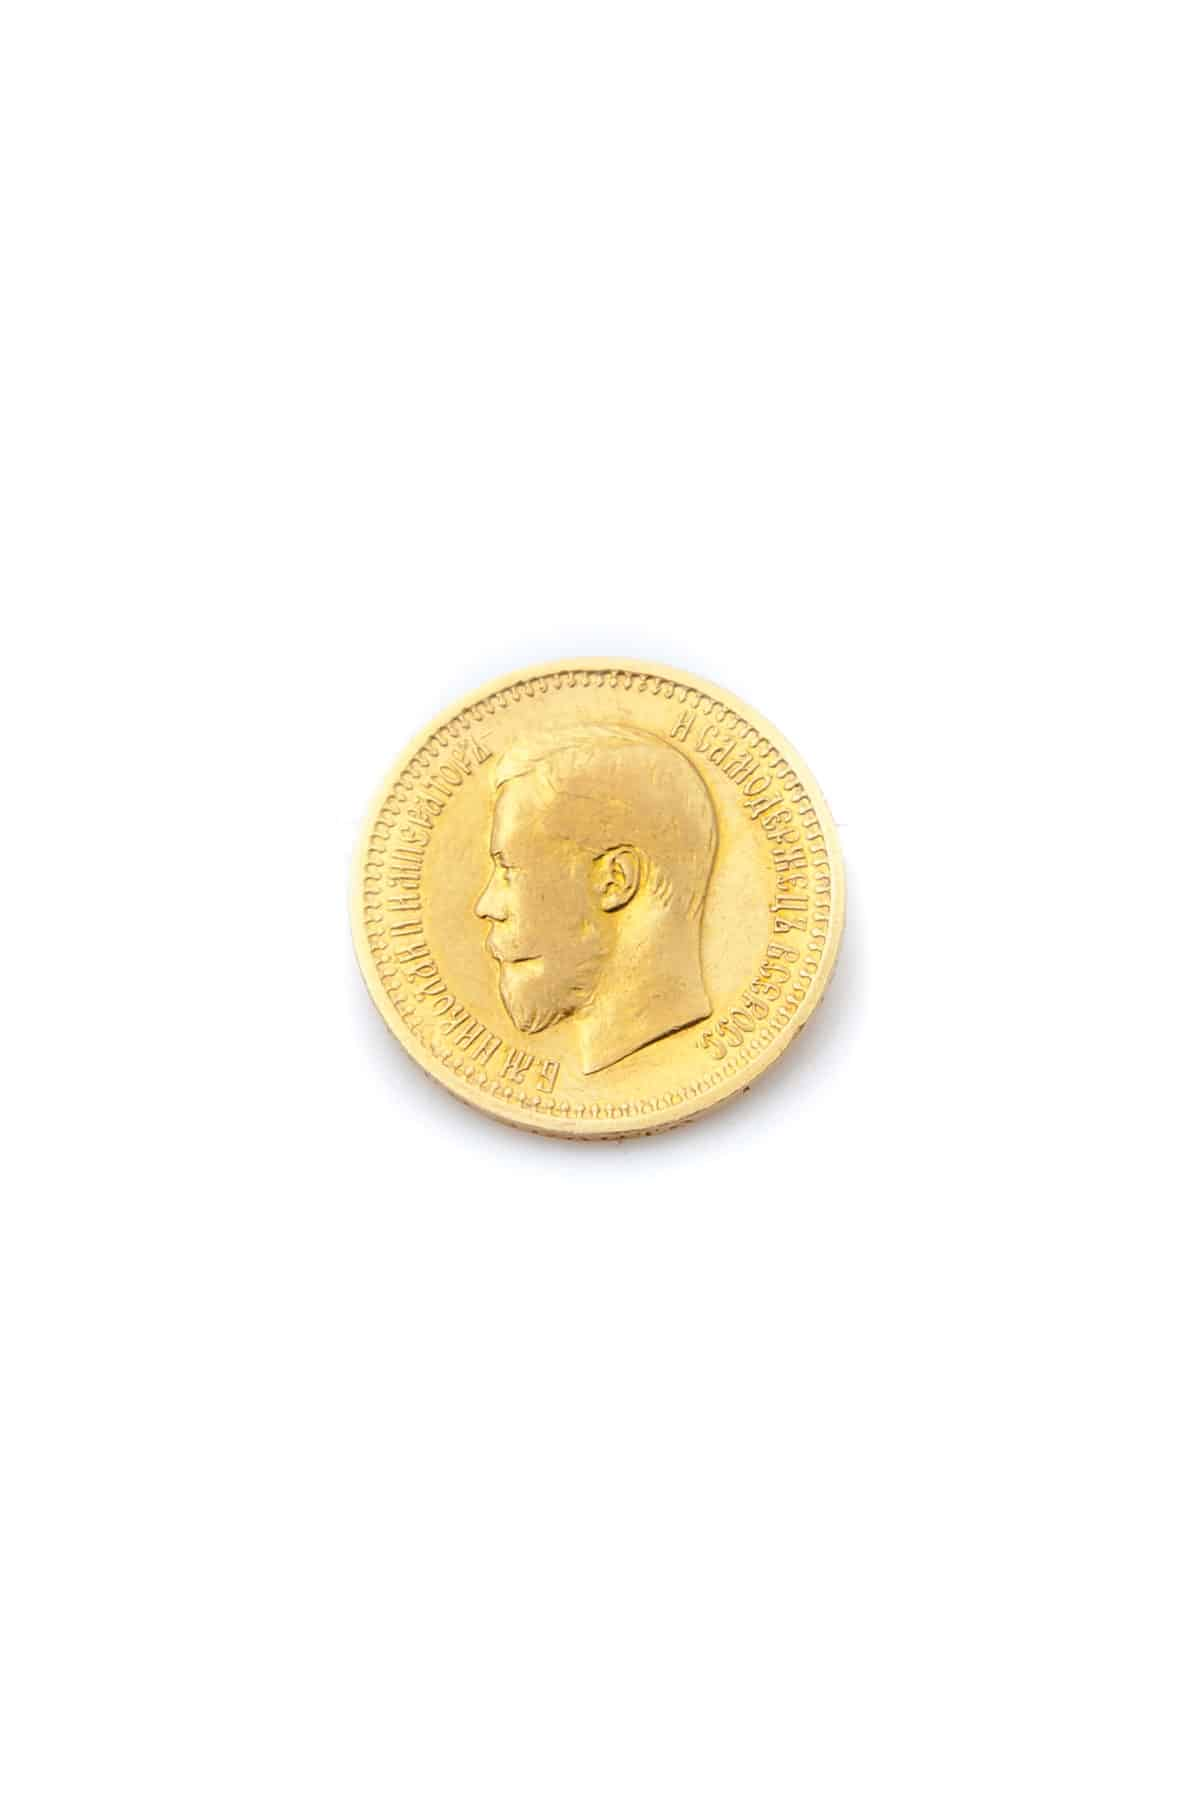 zolotaya moneta sem rubley pyatdesyat kopeek